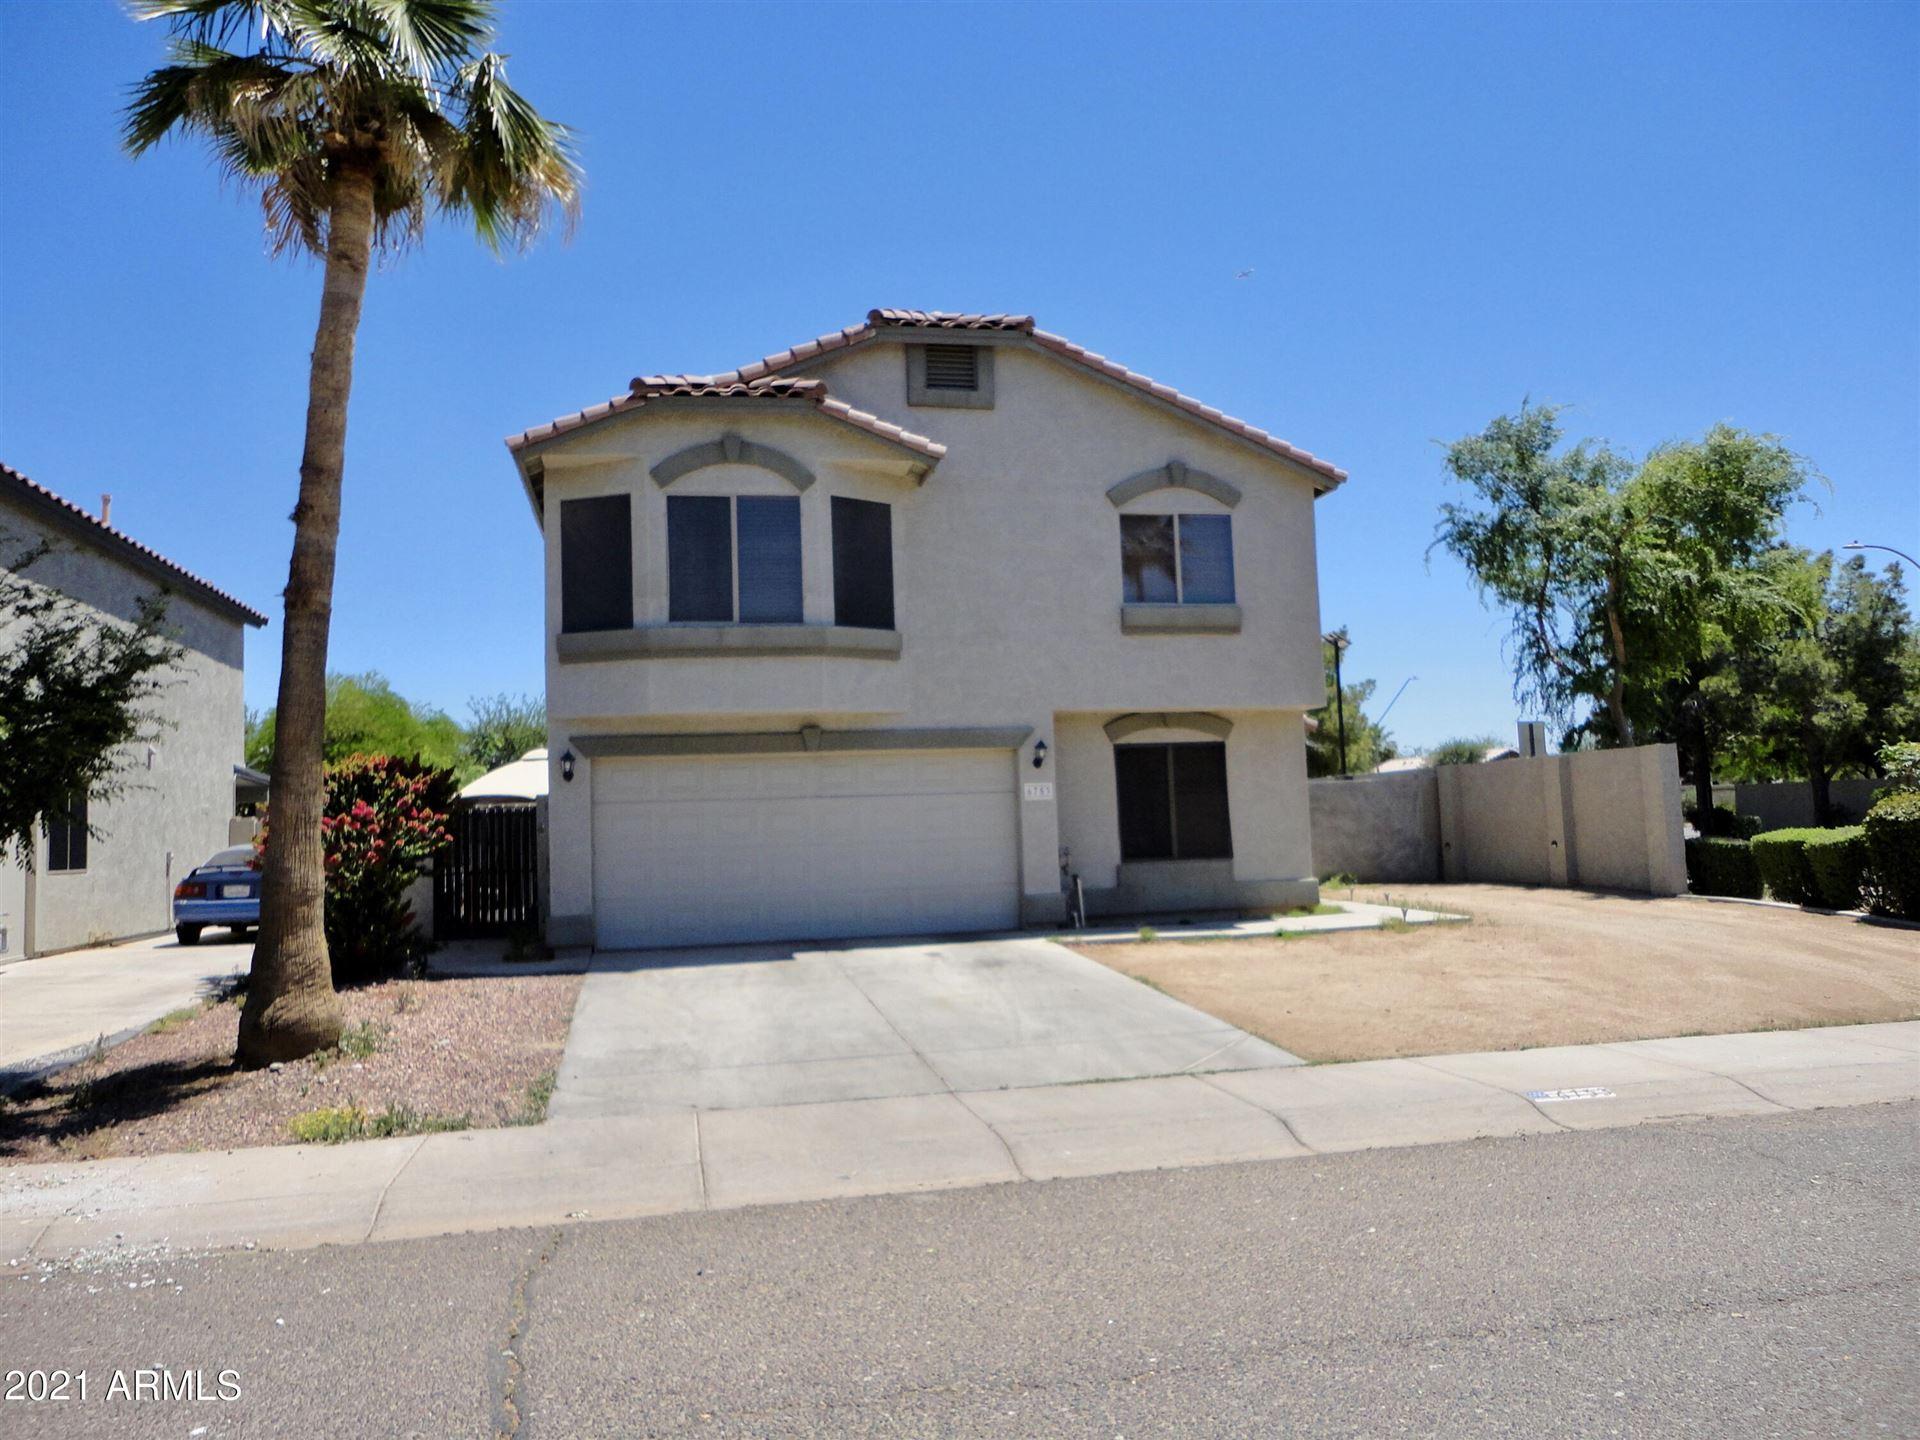 Photo of 6753 N 75TH Drive, Glendale, AZ 85303 (MLS # 6229178)